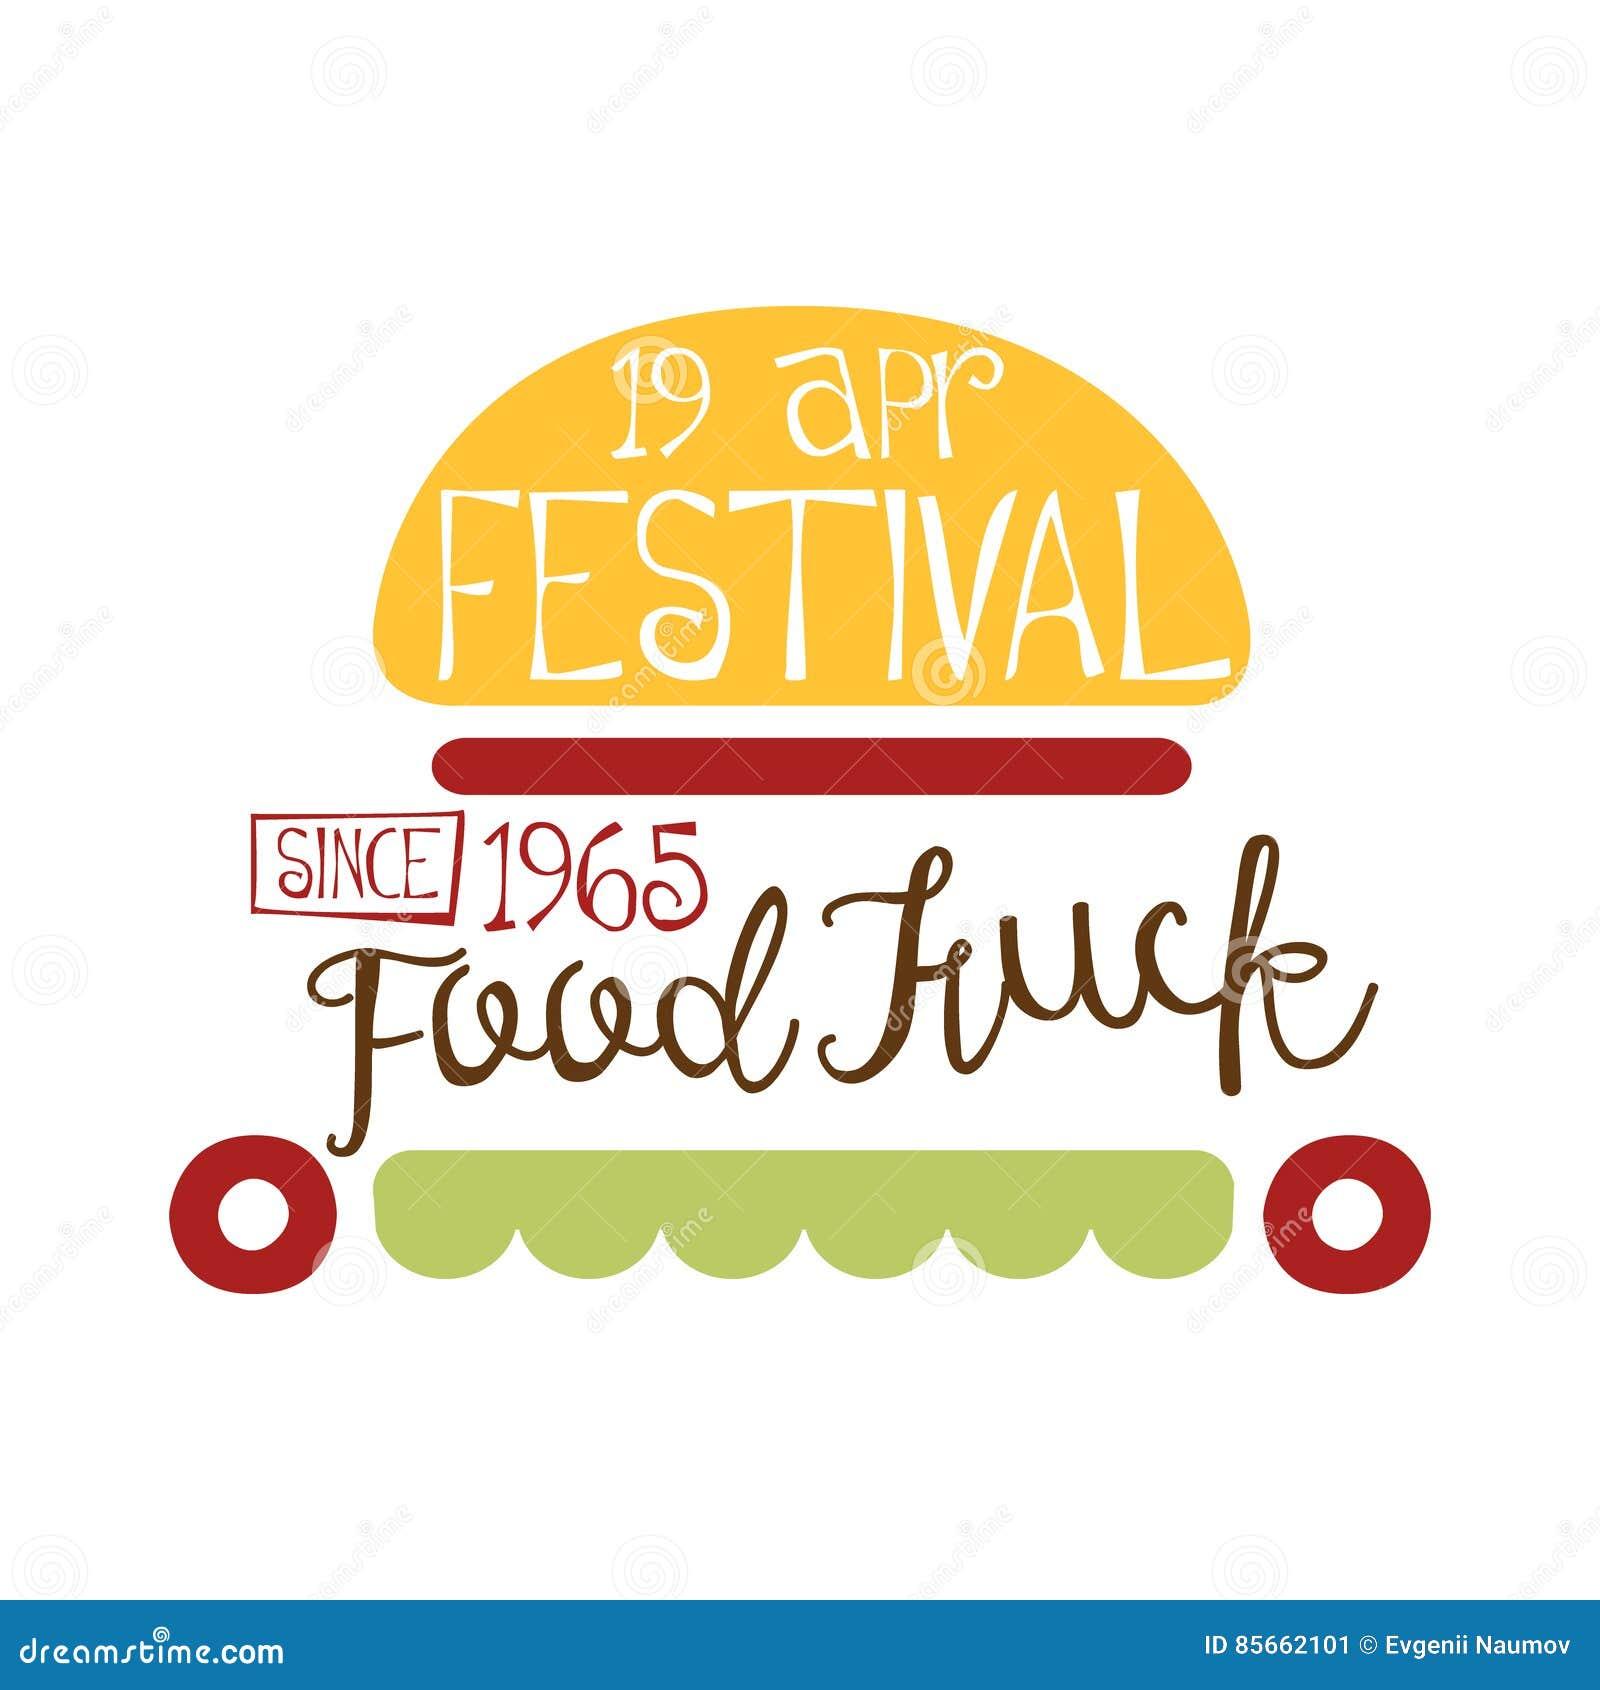 Food Truck Cafe Food Festival Promo Sign Colorful Vector Design